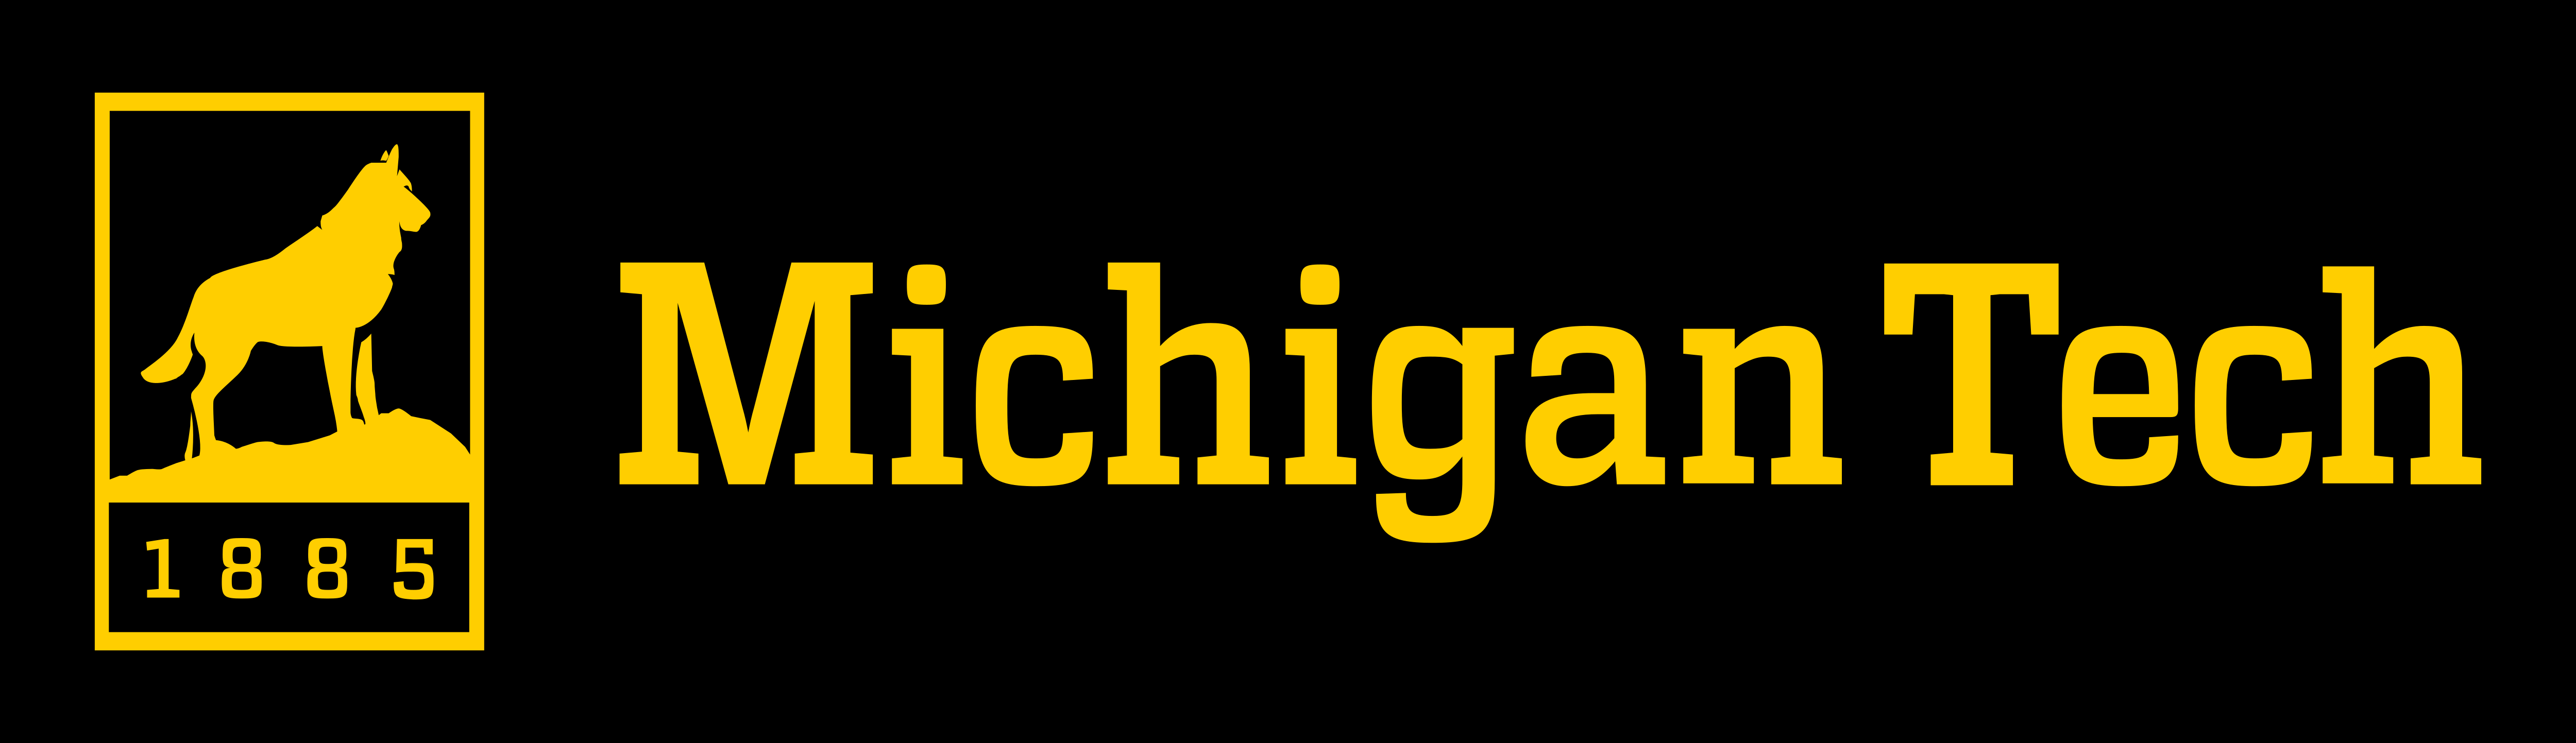 Michigan Technological University - Logos Download